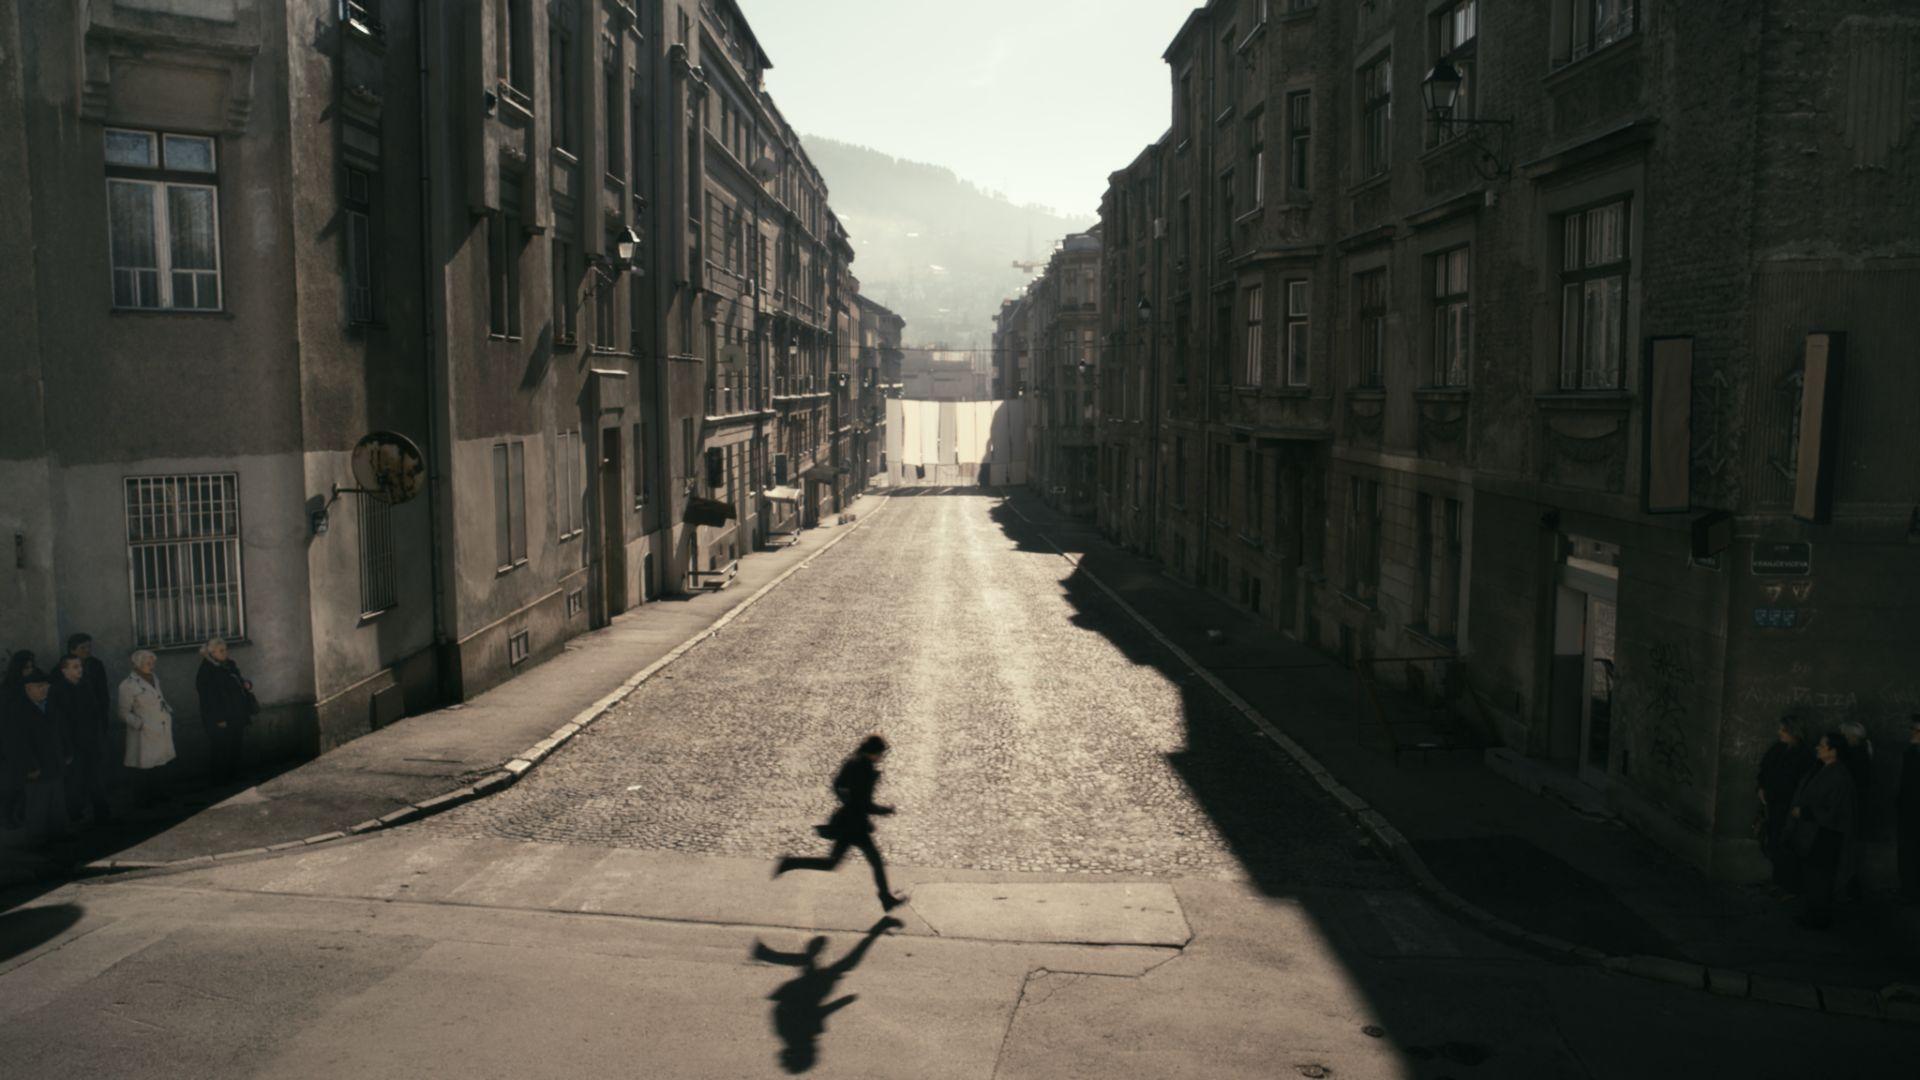 Gropius Bau, Anri Sala, 1395 Days without Red, 2011 © Anri Sala, Šejla Kamerić, Artangel, SCCA/2011, Courtesy: Marian Goodman Gallery und Hauser & Wirth, VG Bild-Kunst, Bonn, 2018